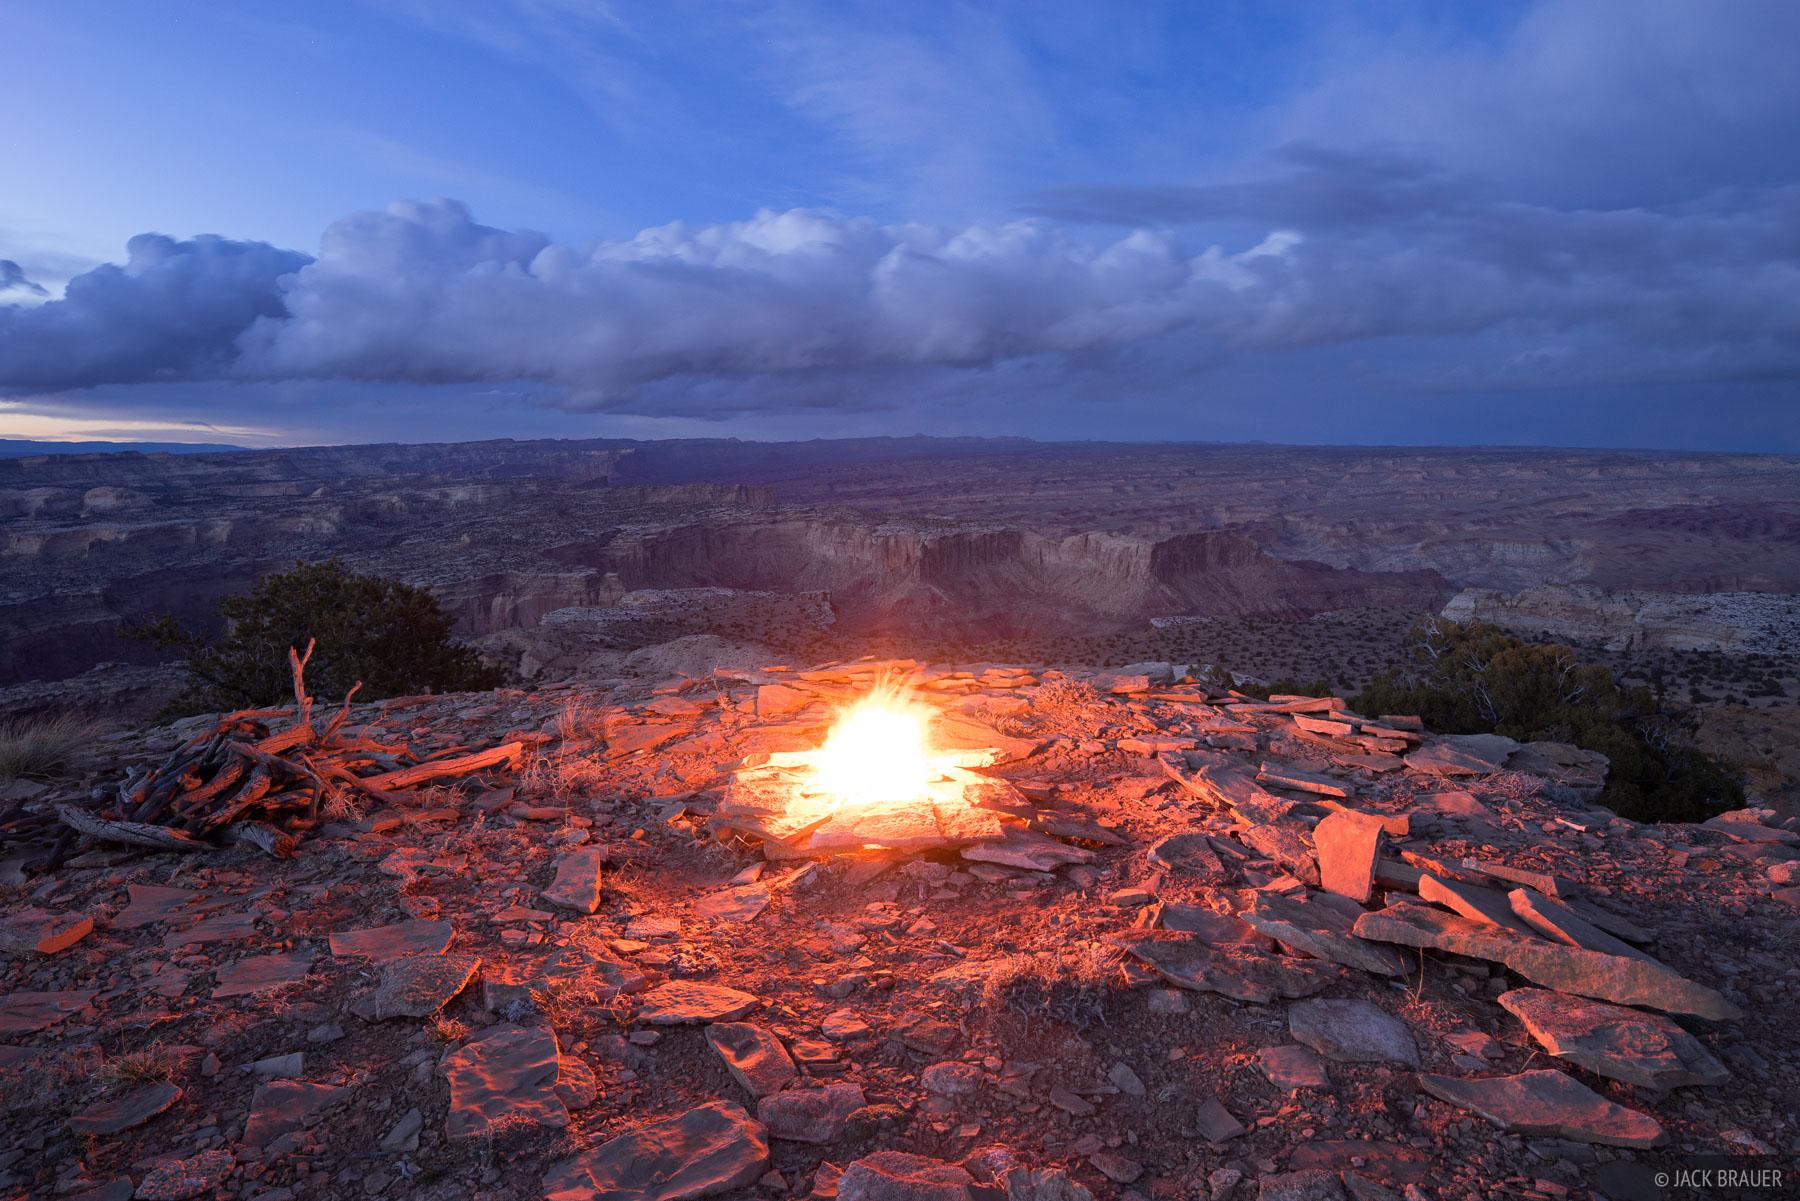 Chimney Canyon,San Rafael Swell,Utah,campfire, photo